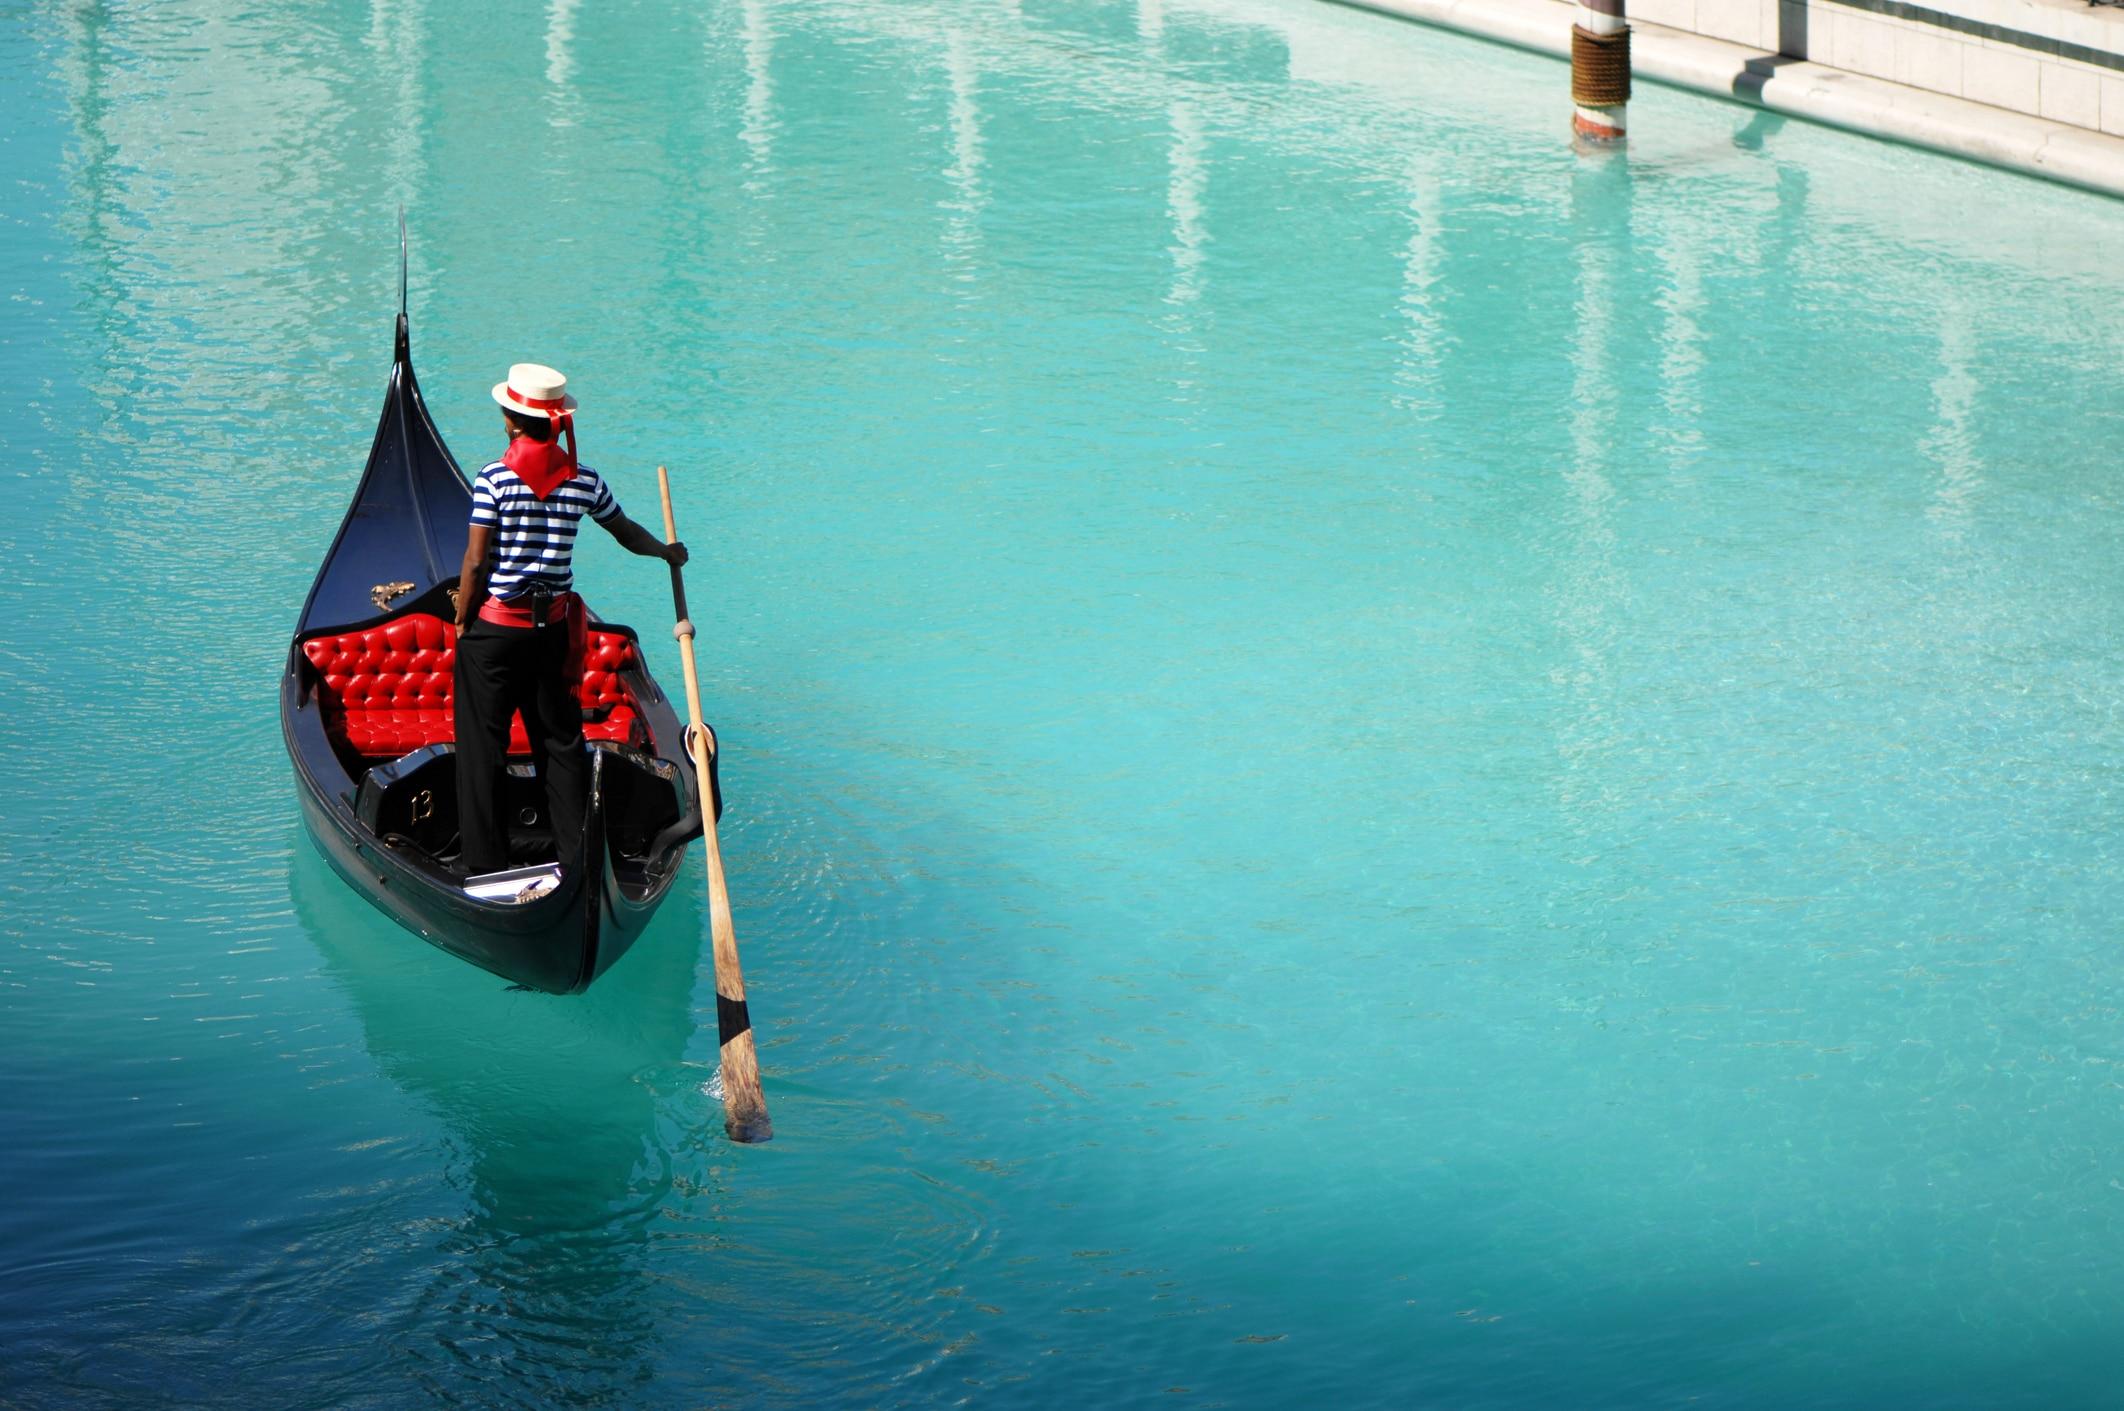 A gondolier paddles a gondola through a canal in a Venetian hotel.